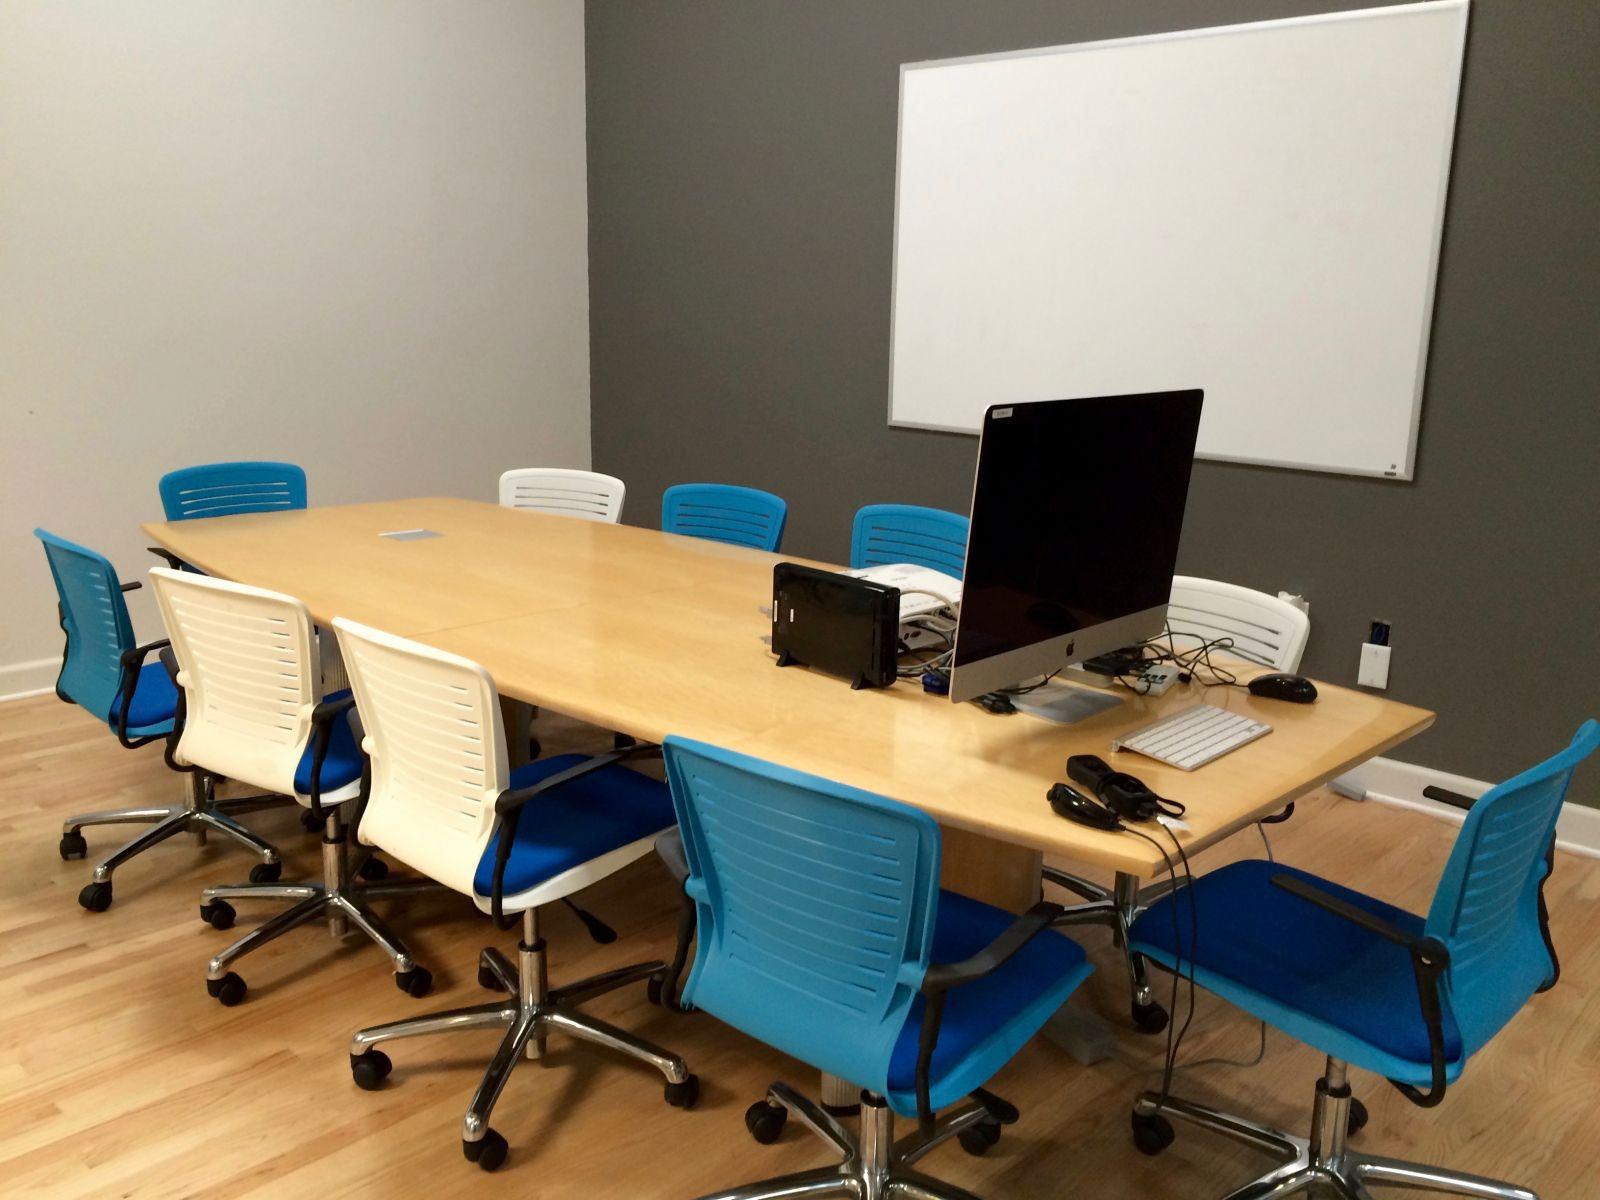 Satellite Coworking Center, Sunnyvale